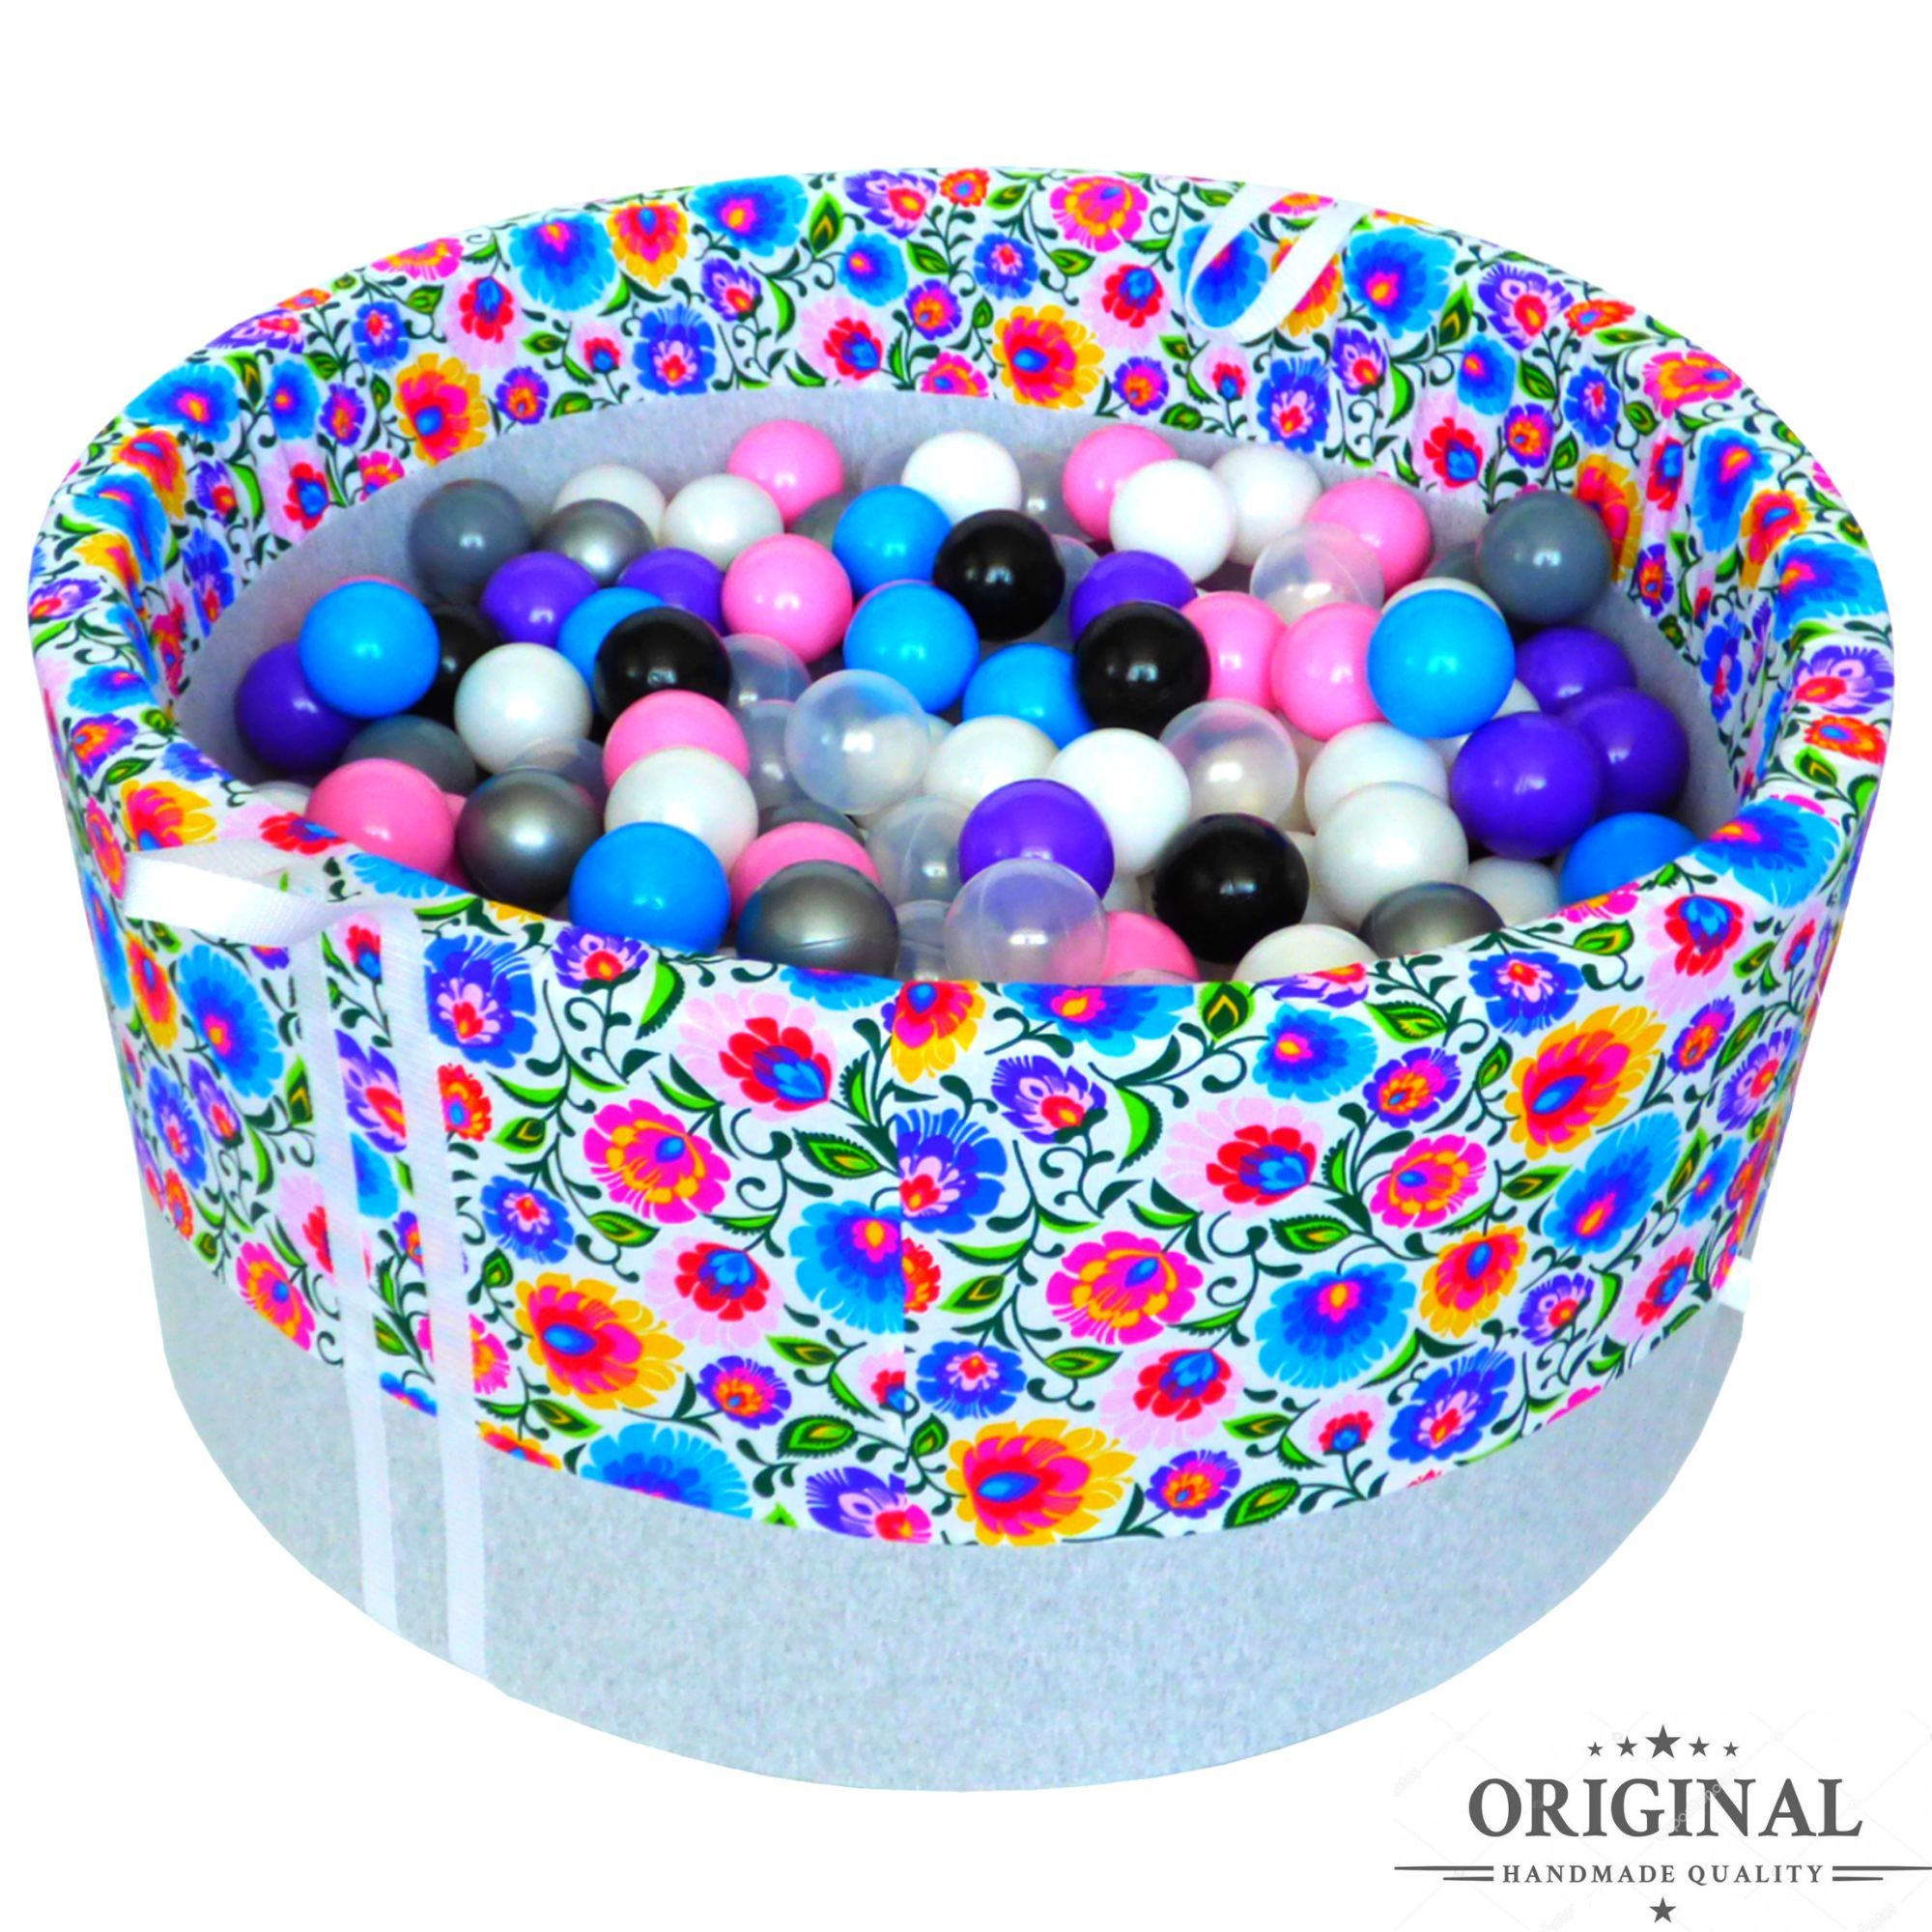 Suchy Basen Z Pilkami Babyball Pool Balls Handmade Ball